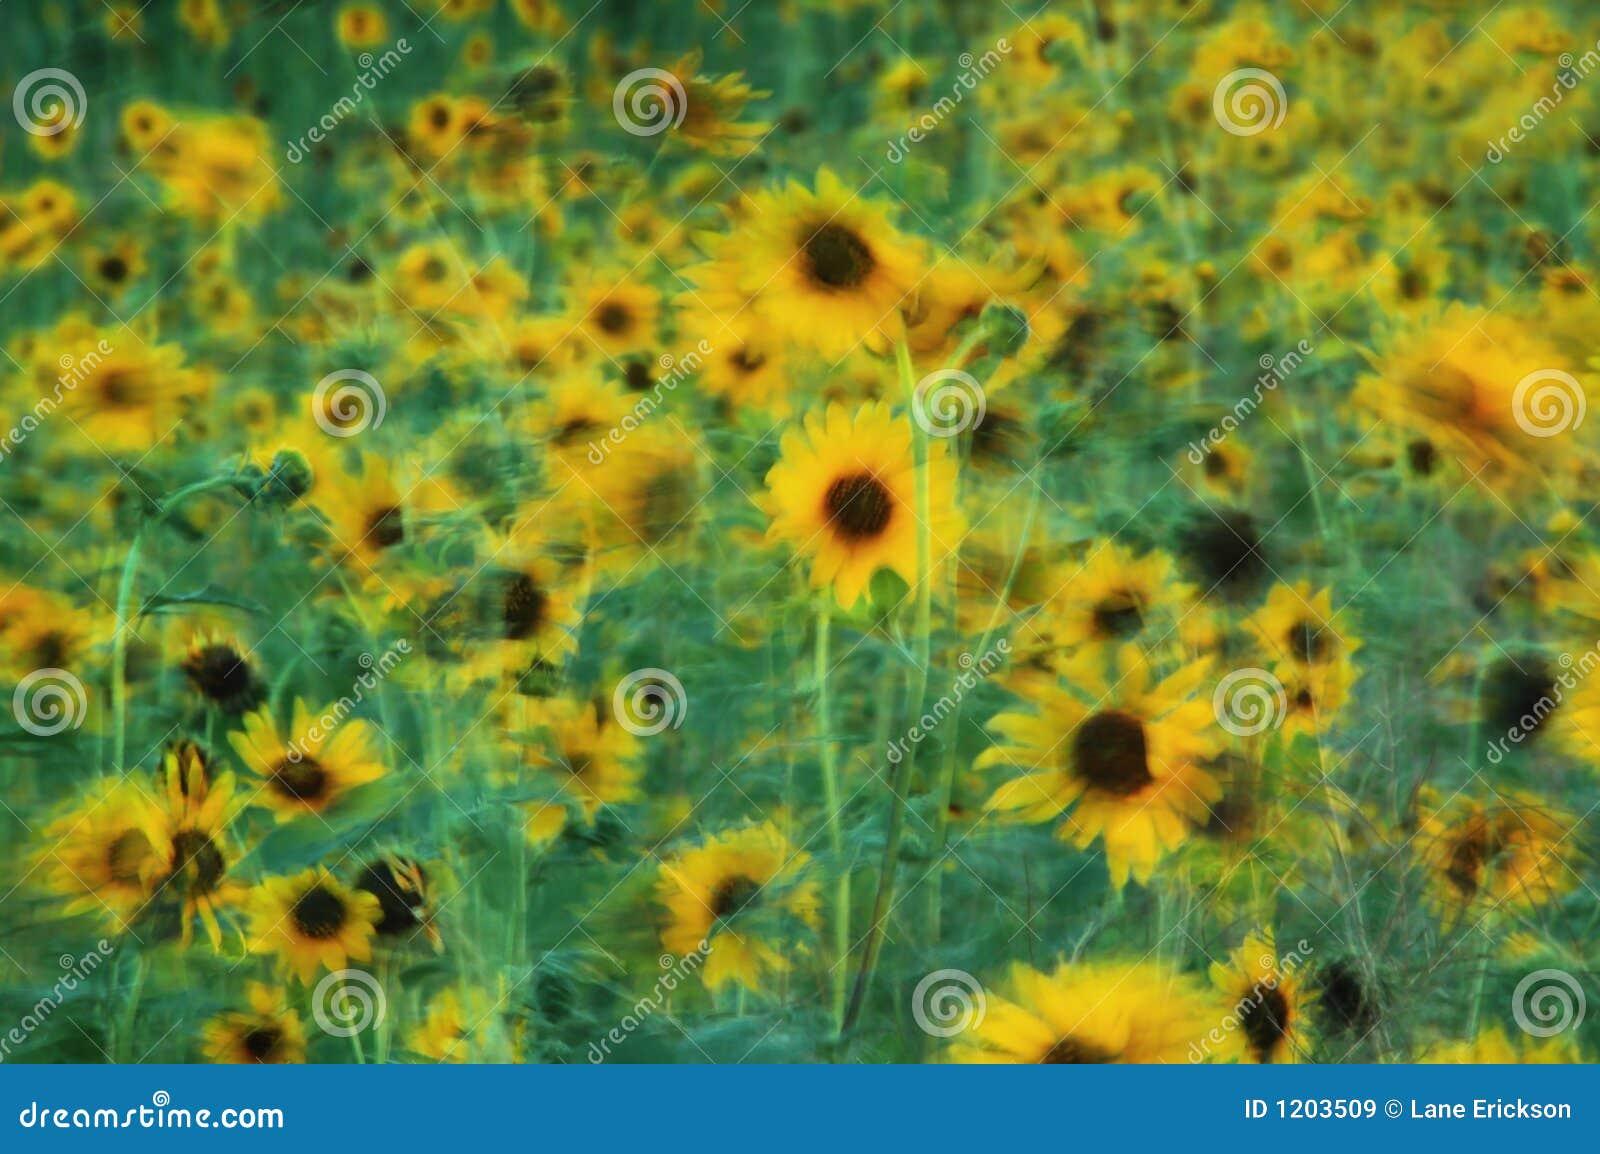 Field of Sunflowers Swaying in Summer Breeze